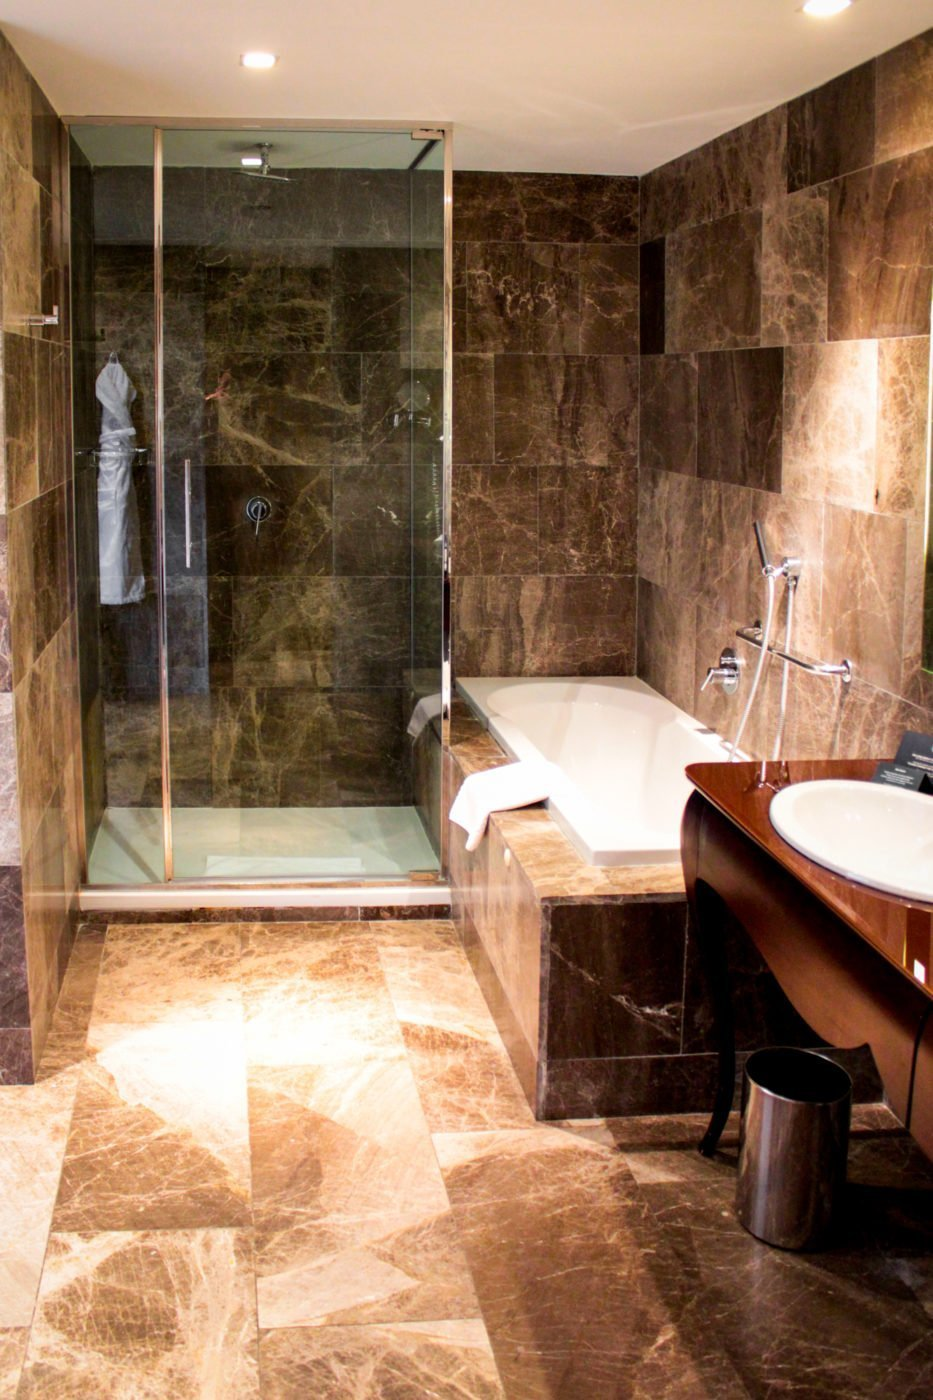 Boscolo budapest hotel review for 5 star hotel bathroom designs